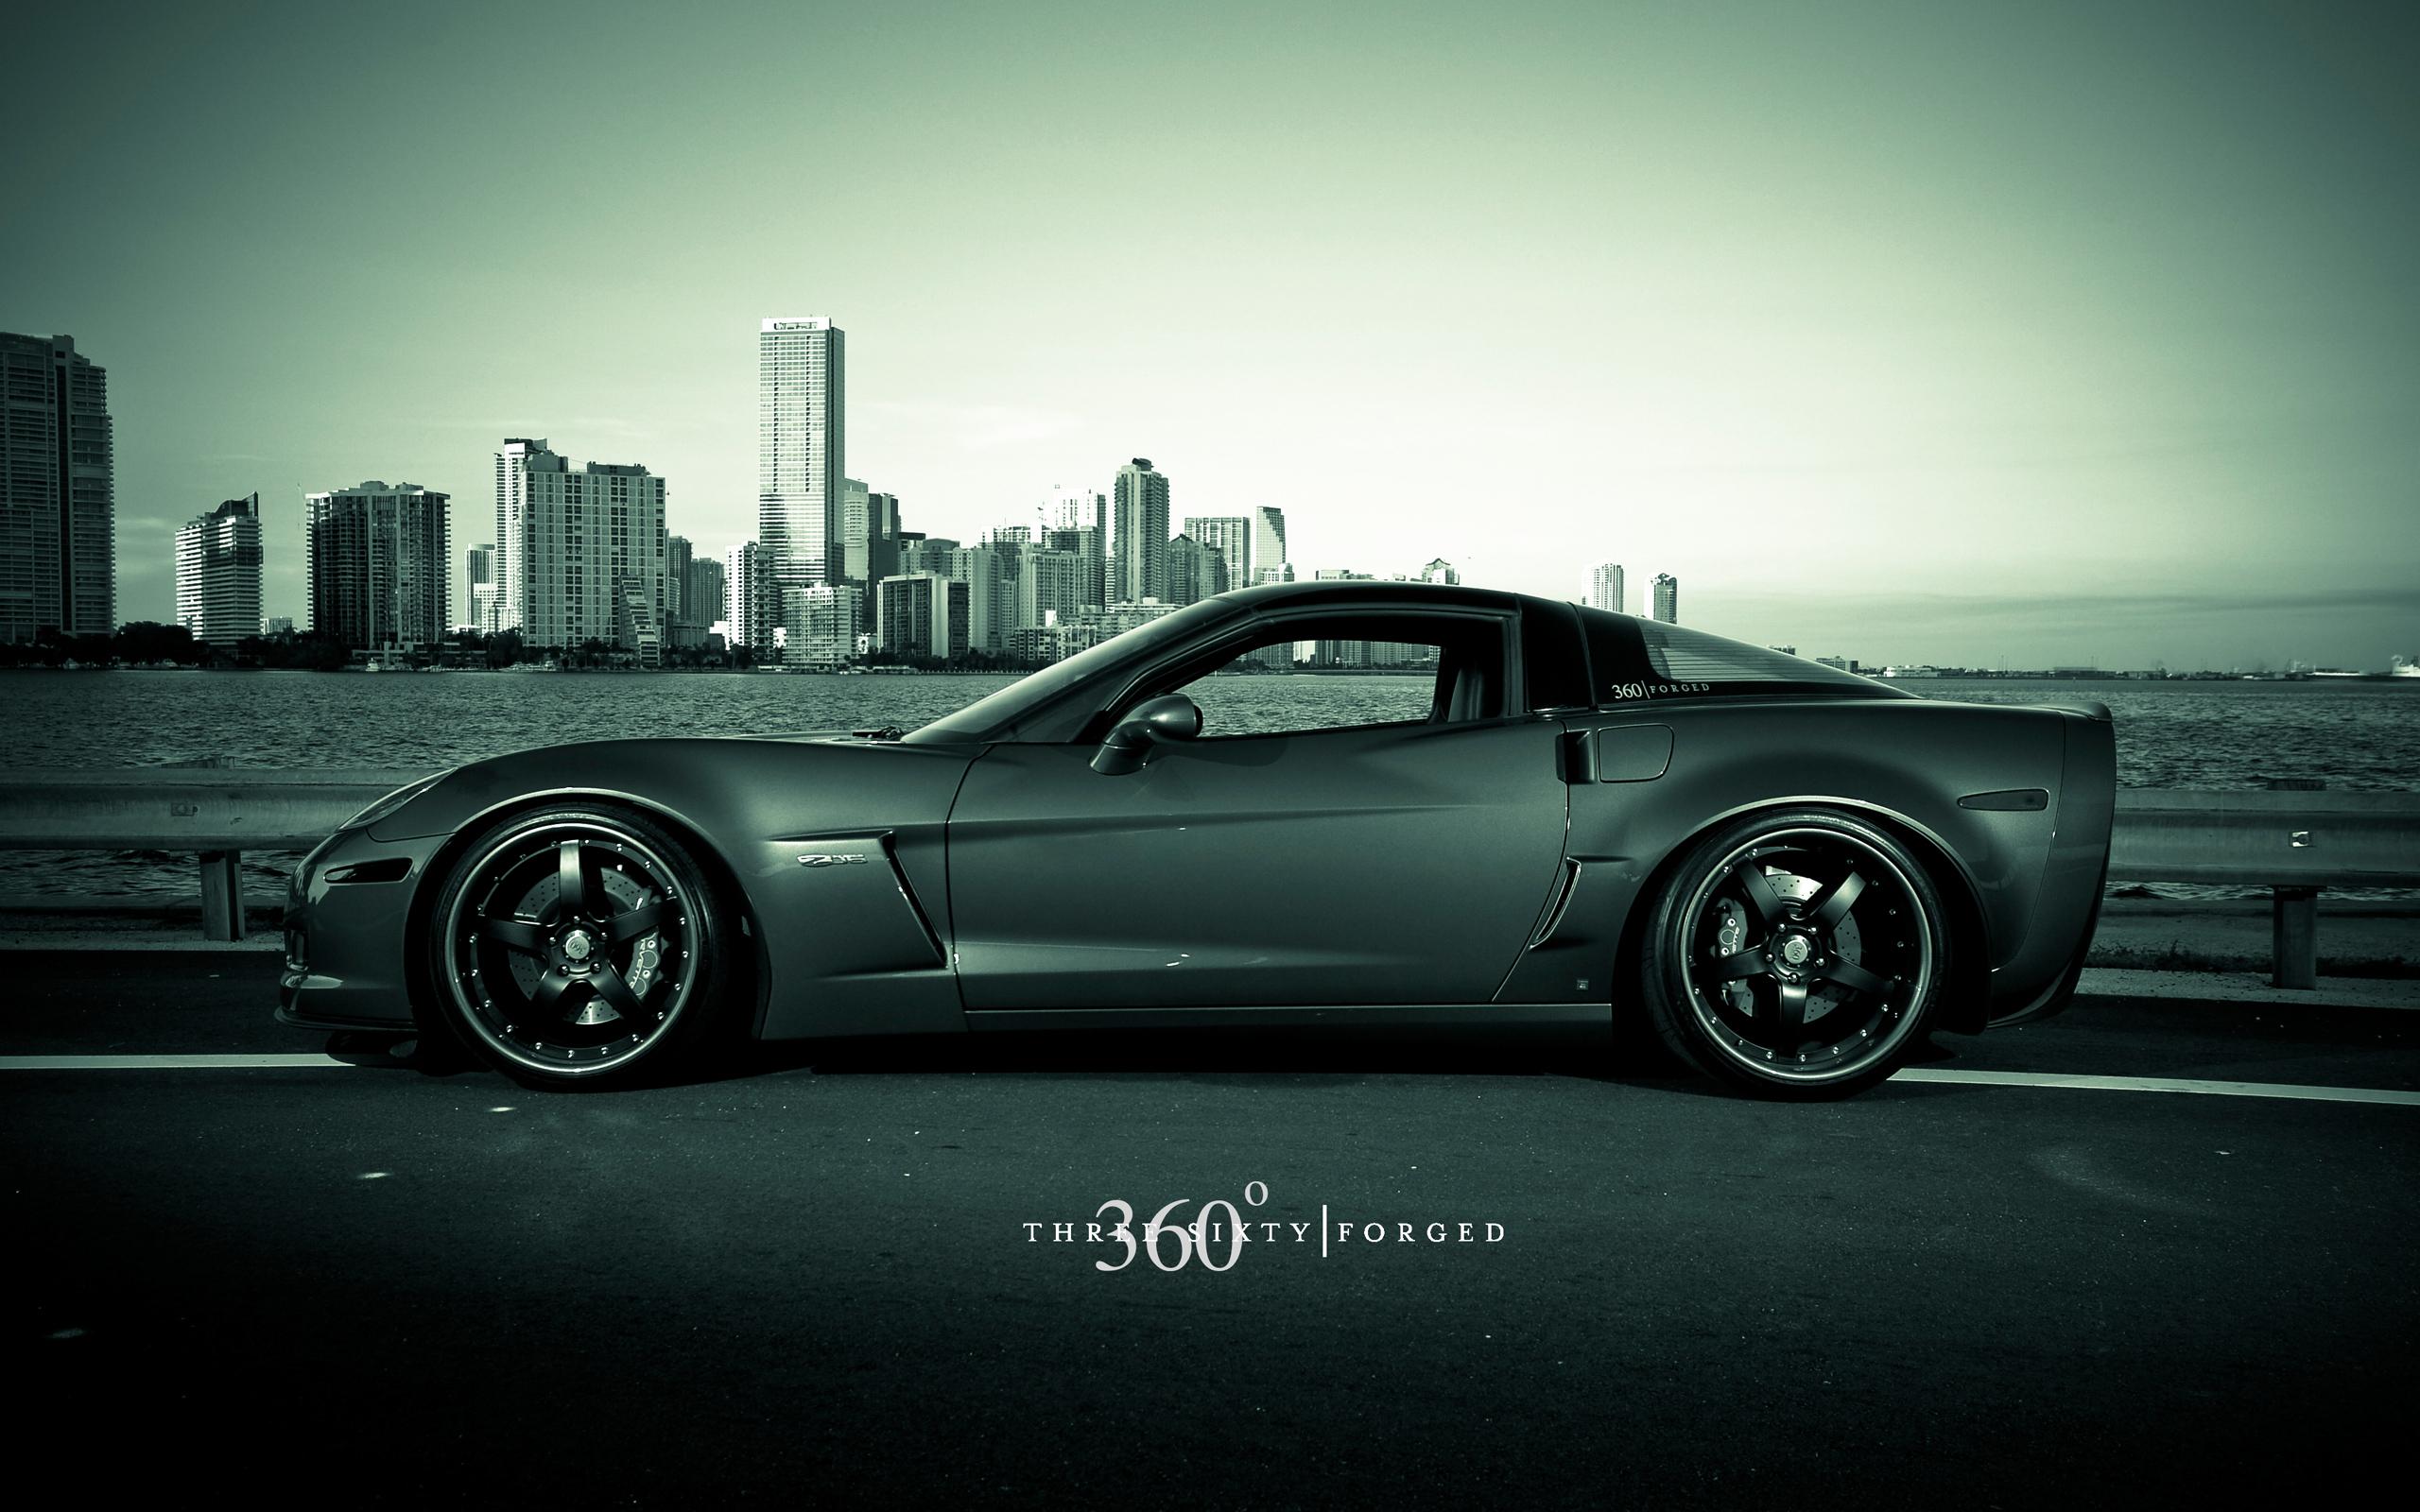 Corvette Z06 HD Wallpaper - WallpaperSafari